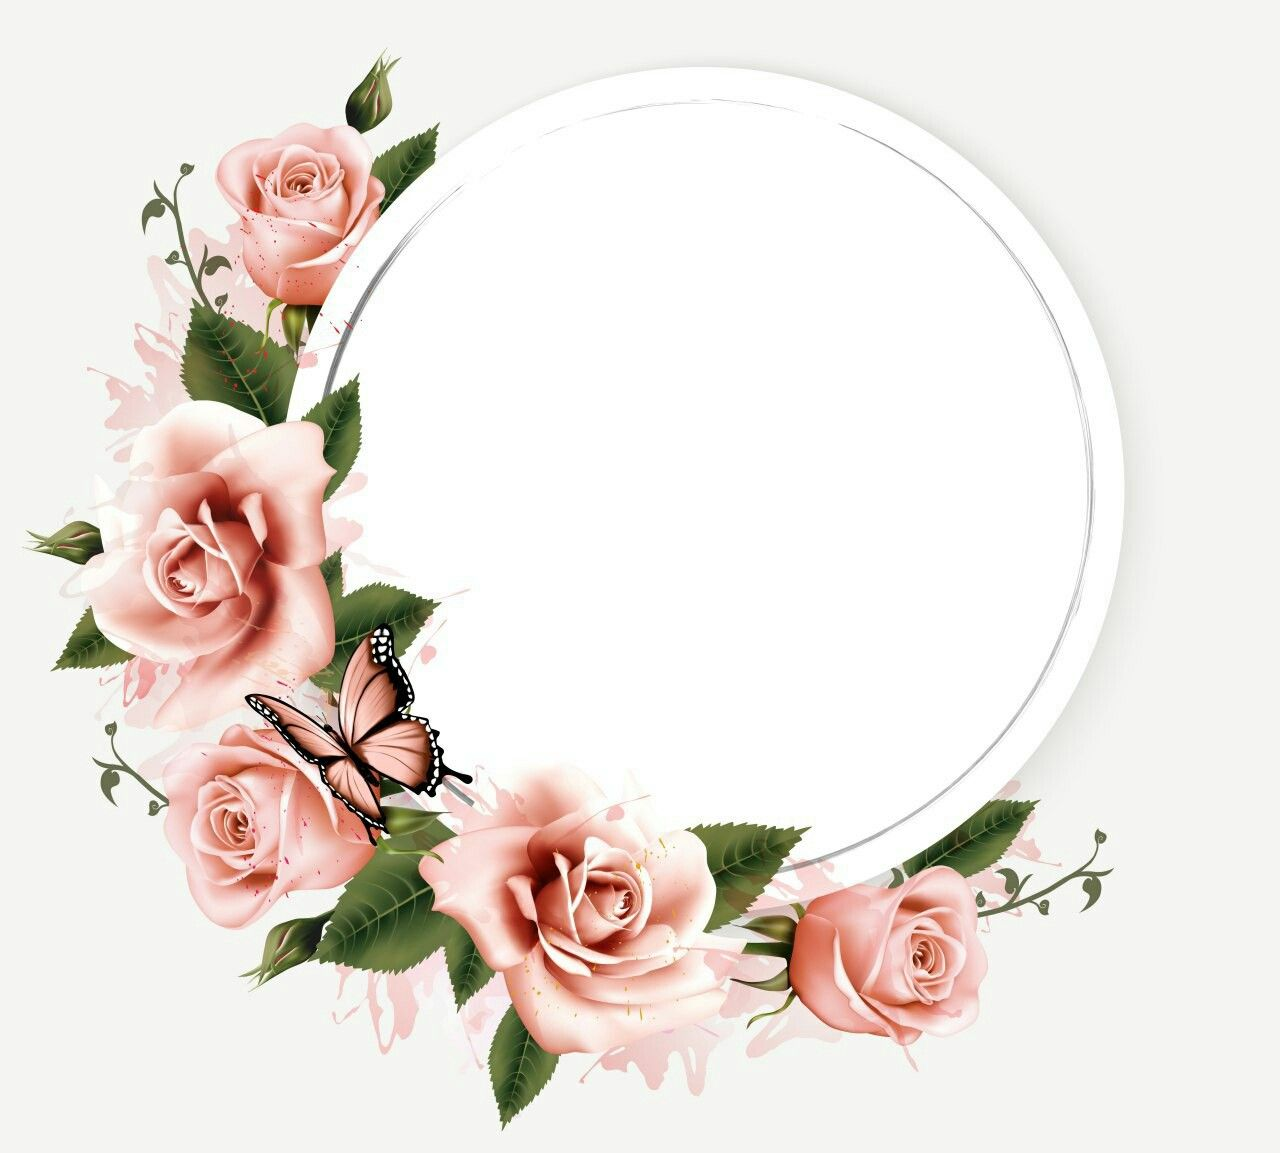 Aazaish Cakez 꽃 프레임 꽃 수채화 아이디어